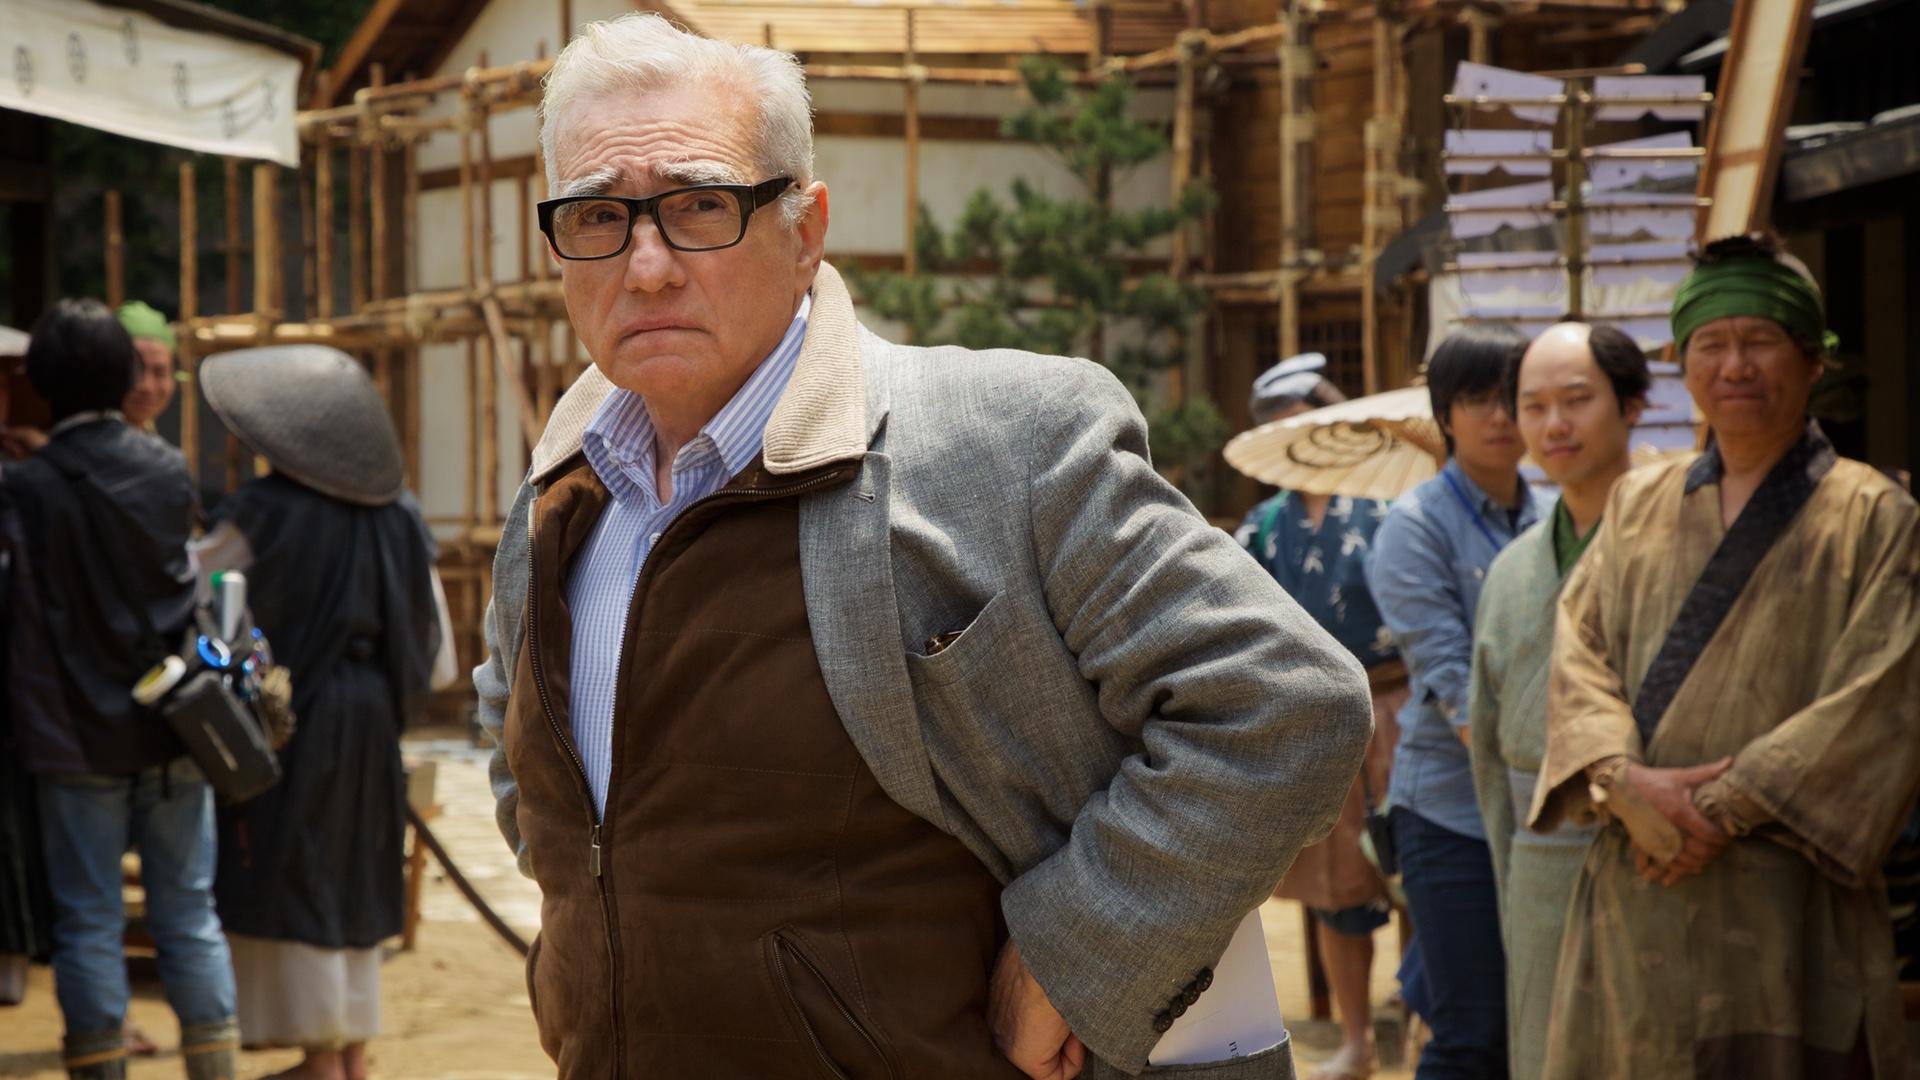 martin-scorsese-says-his-next-film-the-irishman-has-almost-300-scenes-social.jpg